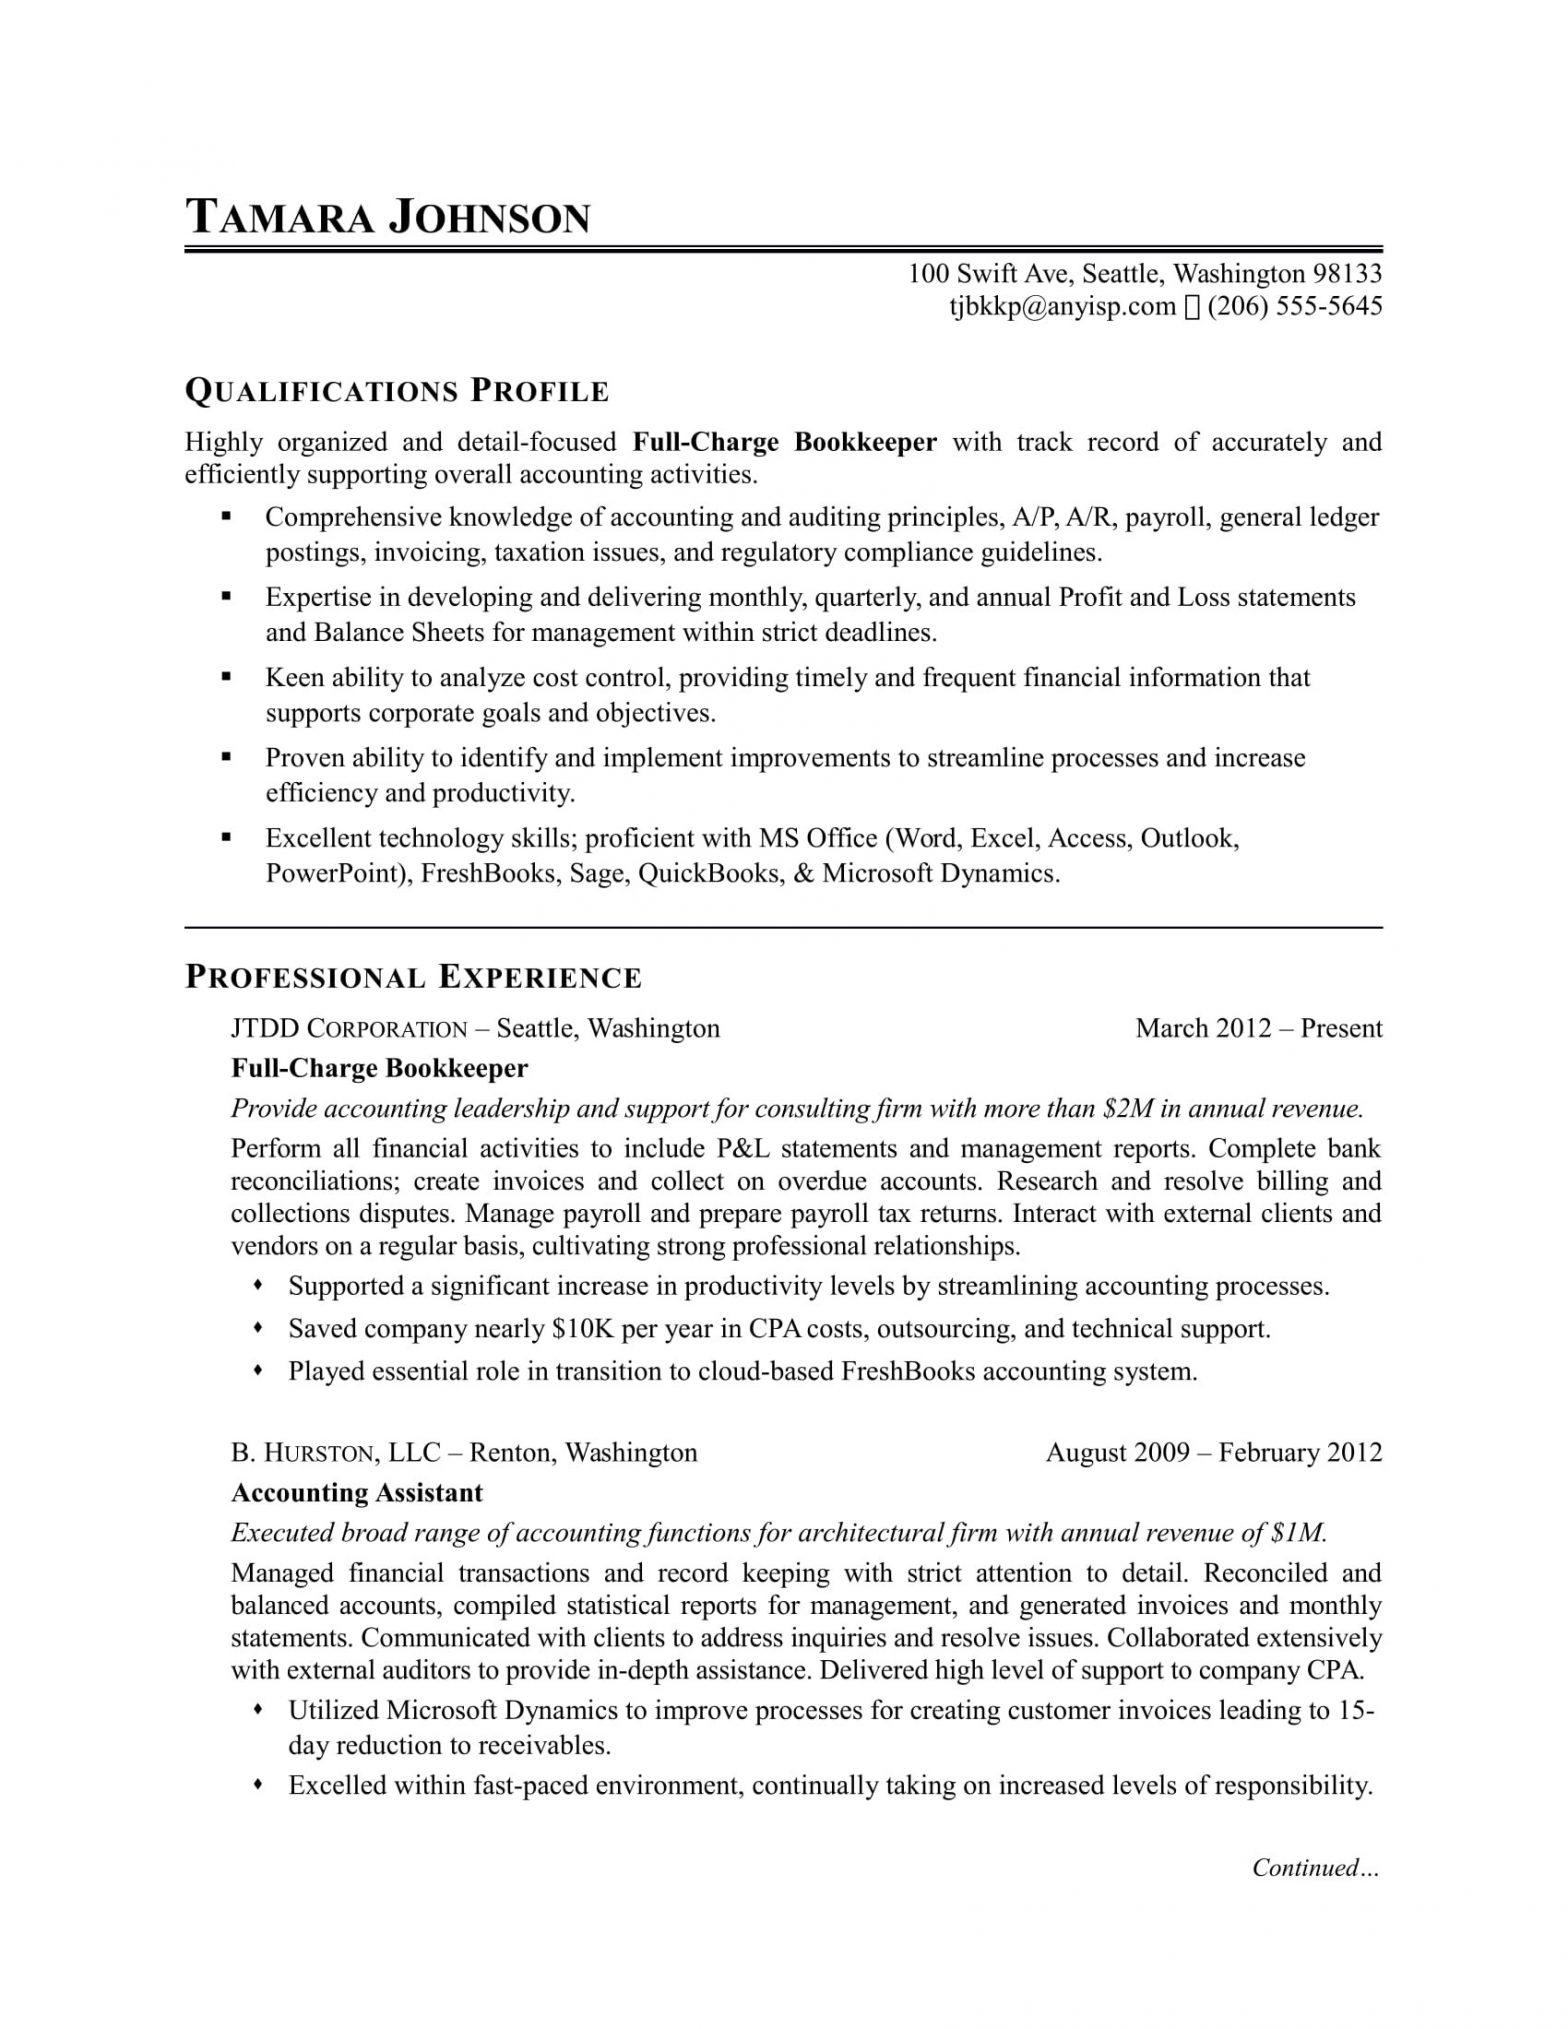 Entry Level Accounting Bookkeeping Resume Sample Bookkeeper Resume Sample Monster.com